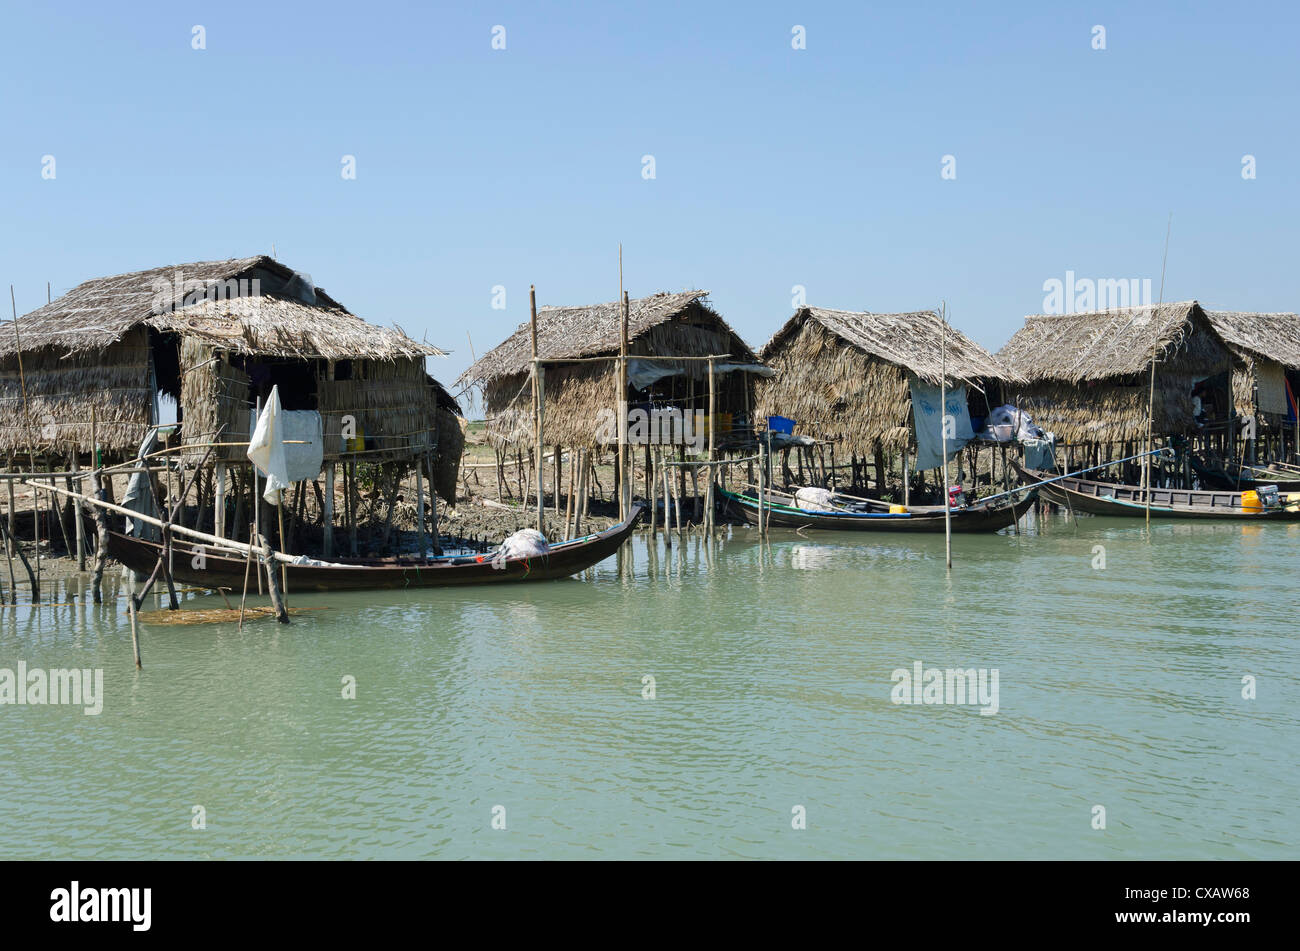 Bamboo huts and boats along a waterway, Irrawaddy delta, Myanmar (Burma), Asia Stock Photo